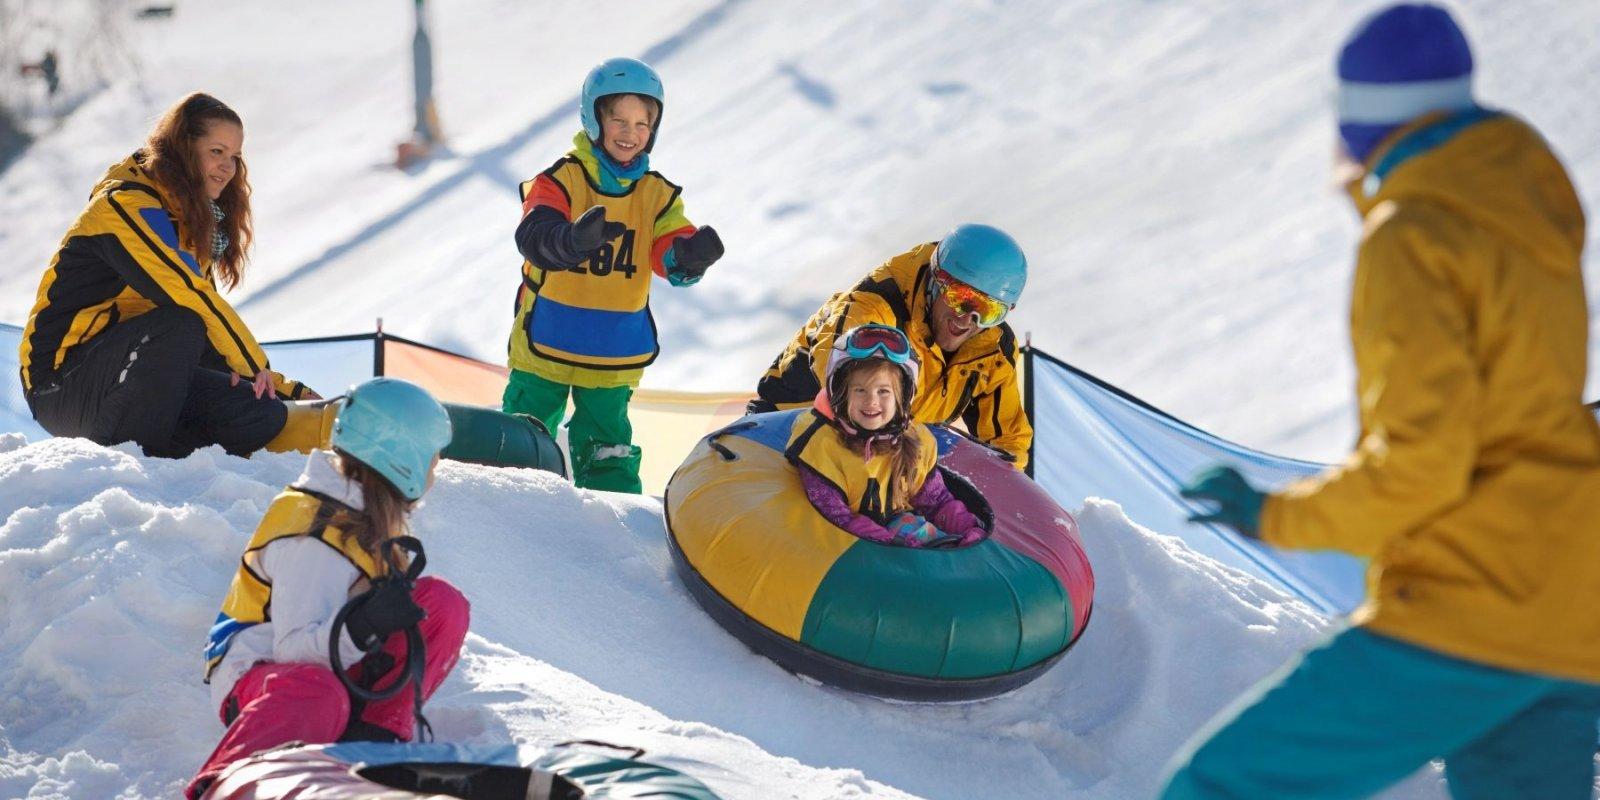 Při snowtubingu ve skiareálu Novako si užijete spoustu legrace.